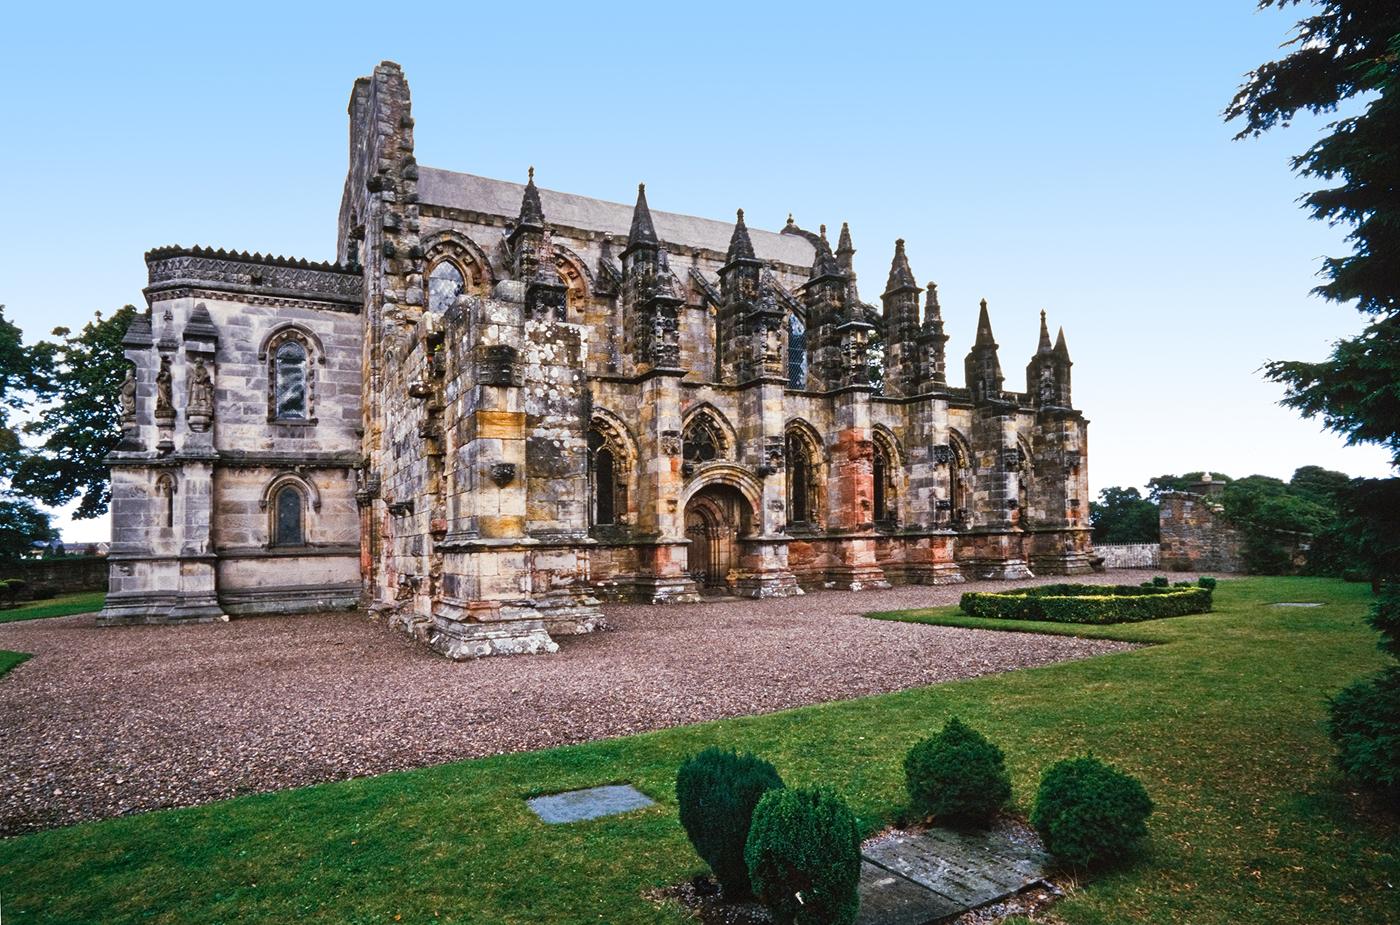 Scotland's Rosslyn Chapel from socialtravel.pl